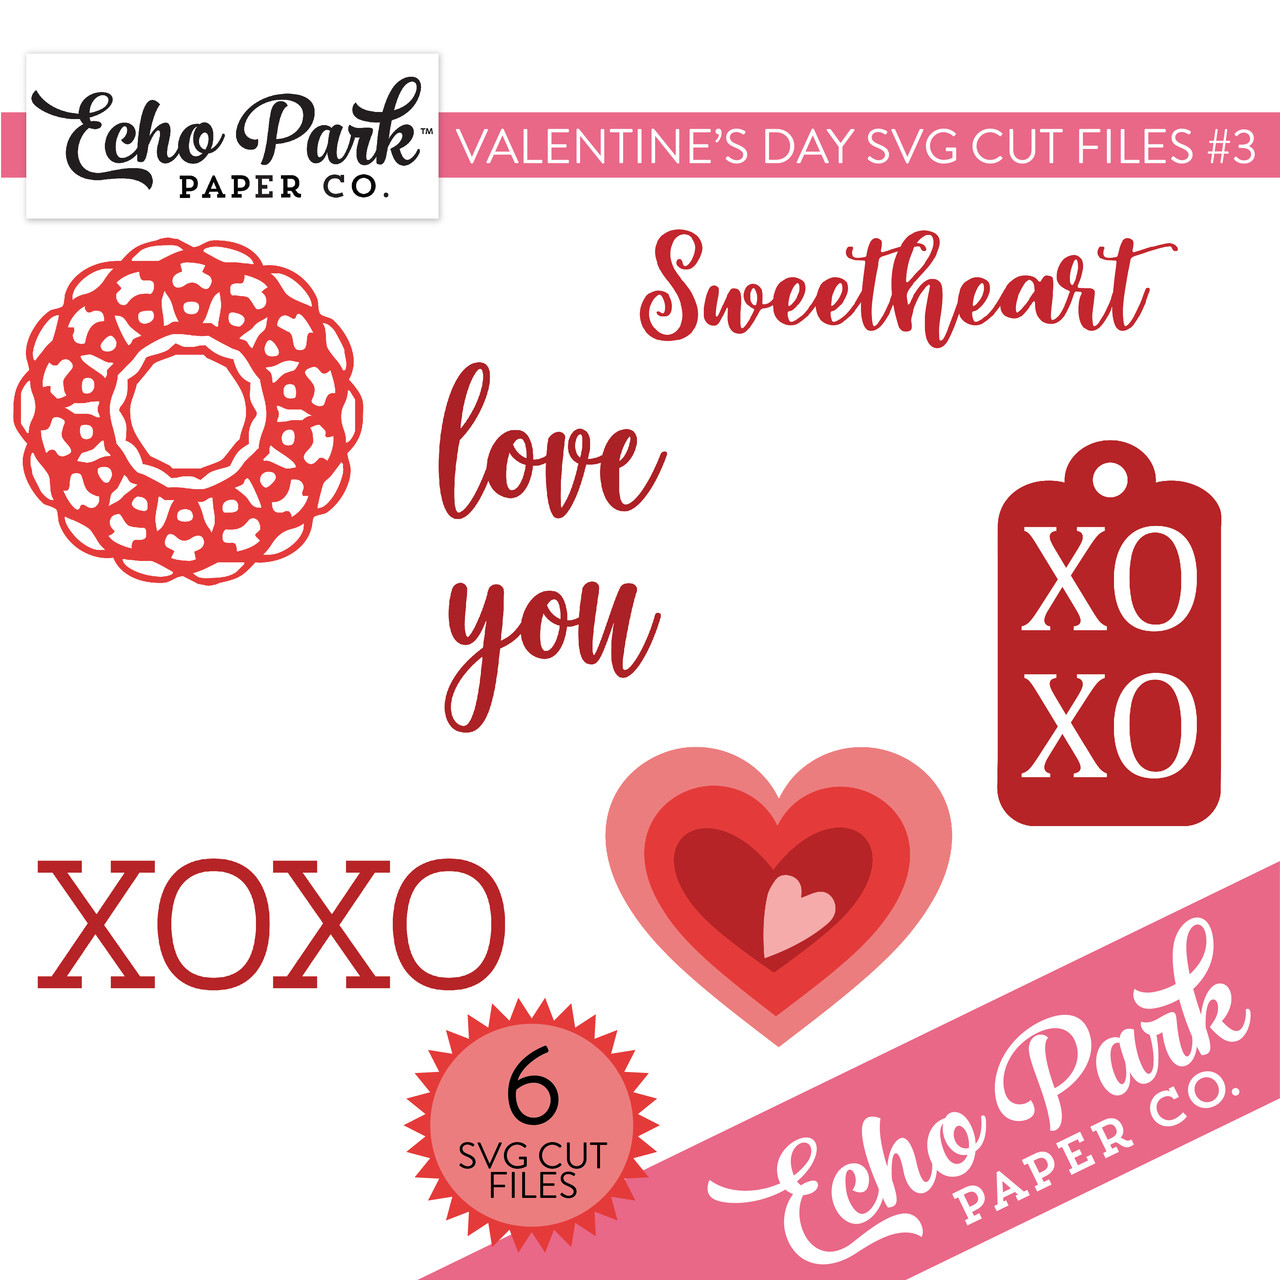 Valentines SVG Cut Files #3